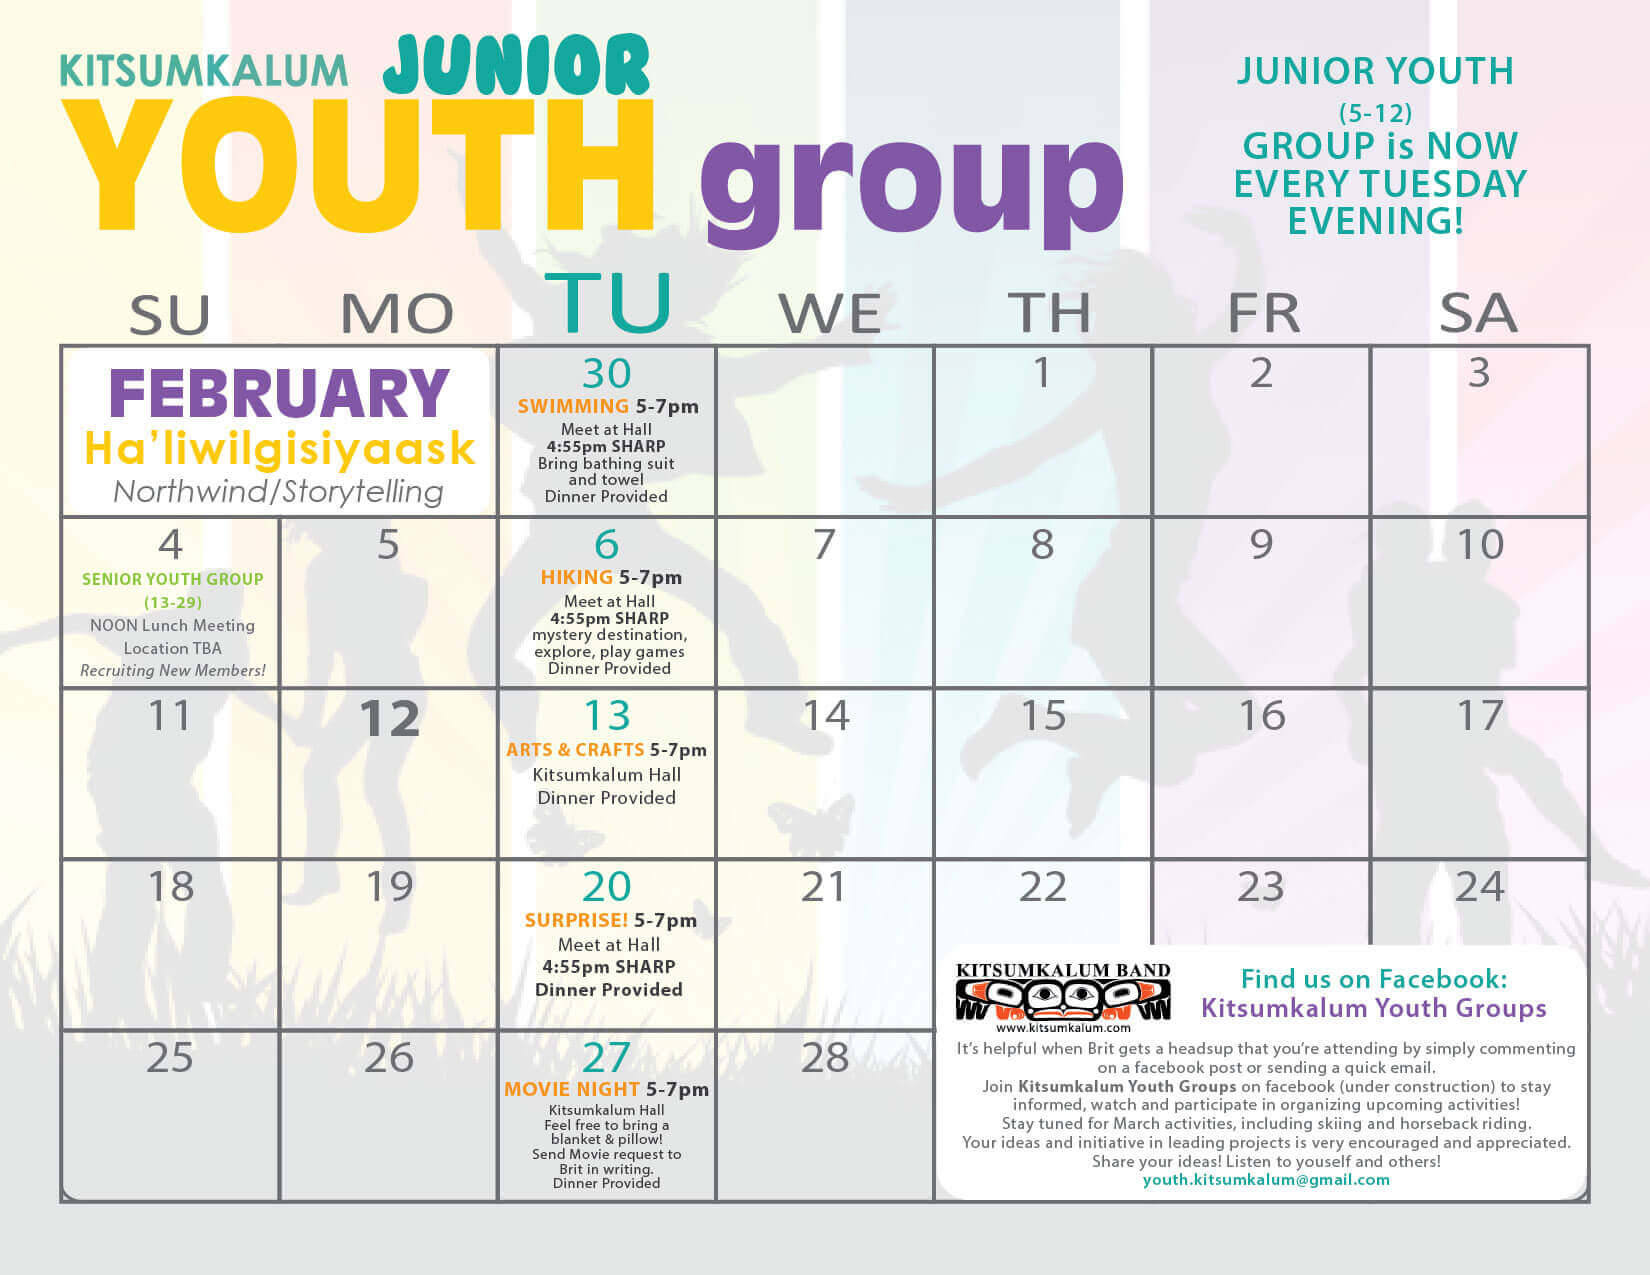 Junior Youth MOVIE NIGHT Feb 27th